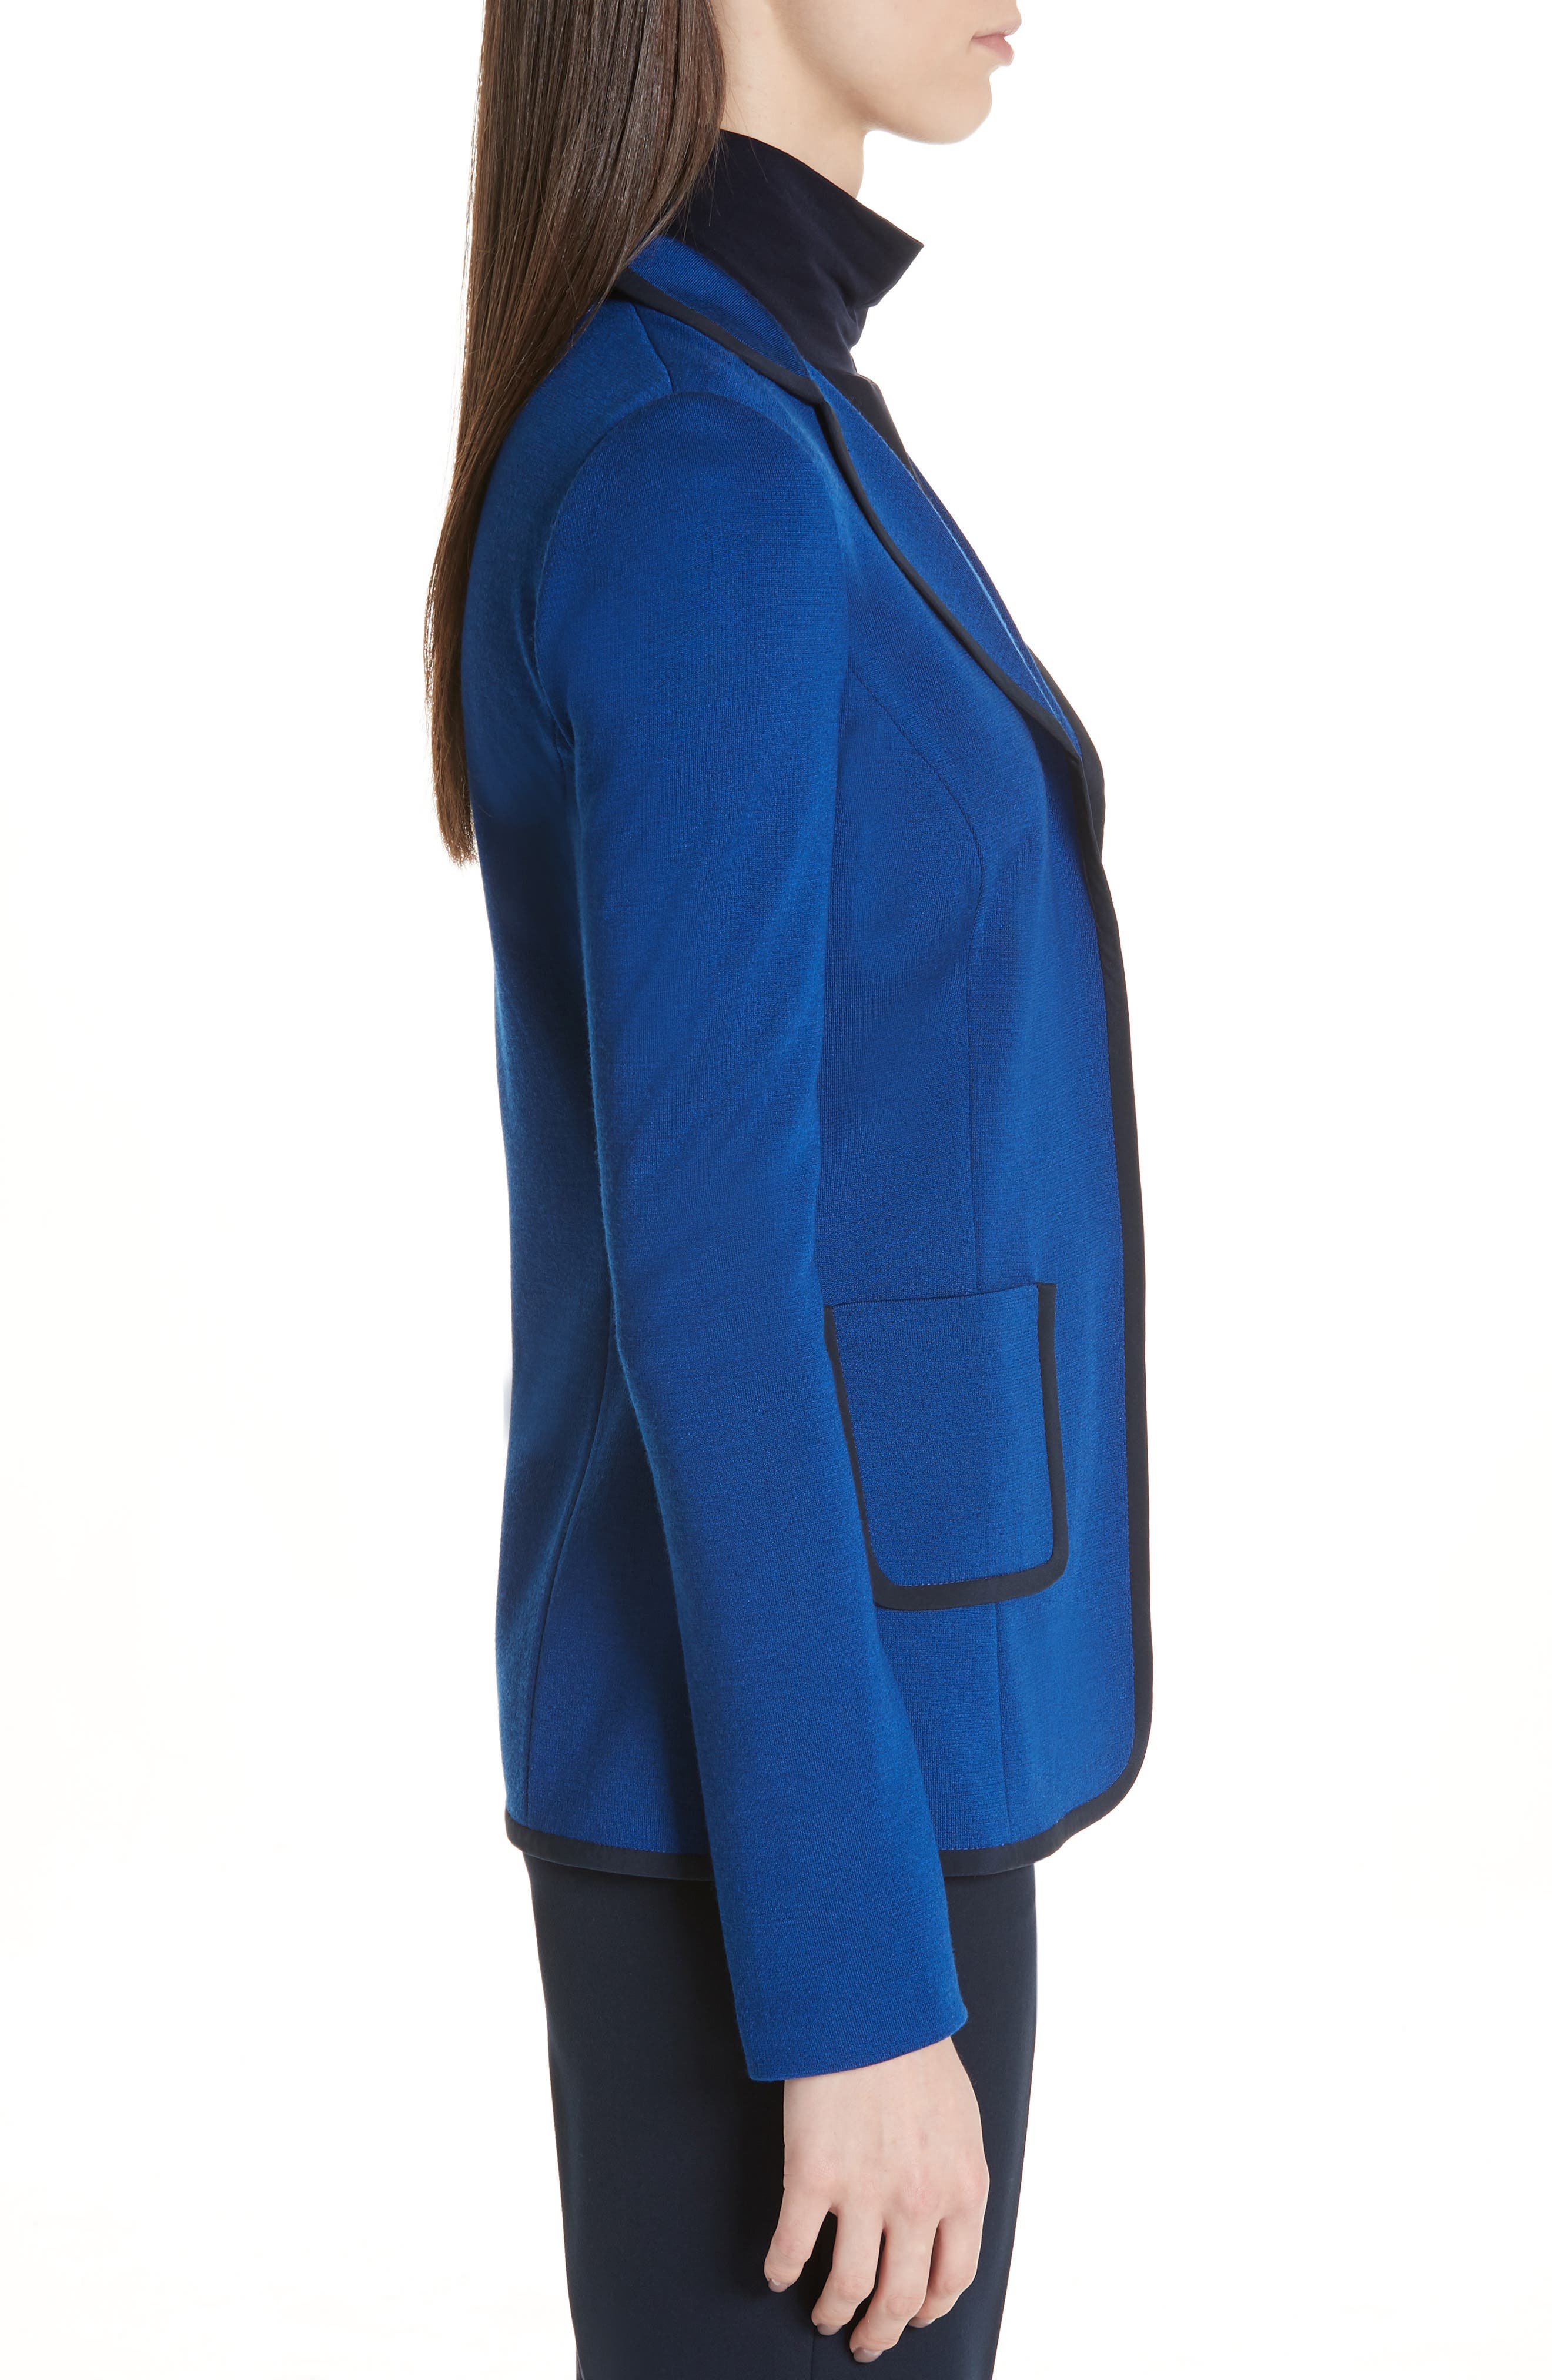 ST. JOHN COLLECTION, Patch Pocket Milano Knit Jacket, Alternate thumbnail 4, color, AZUL/ NAVY